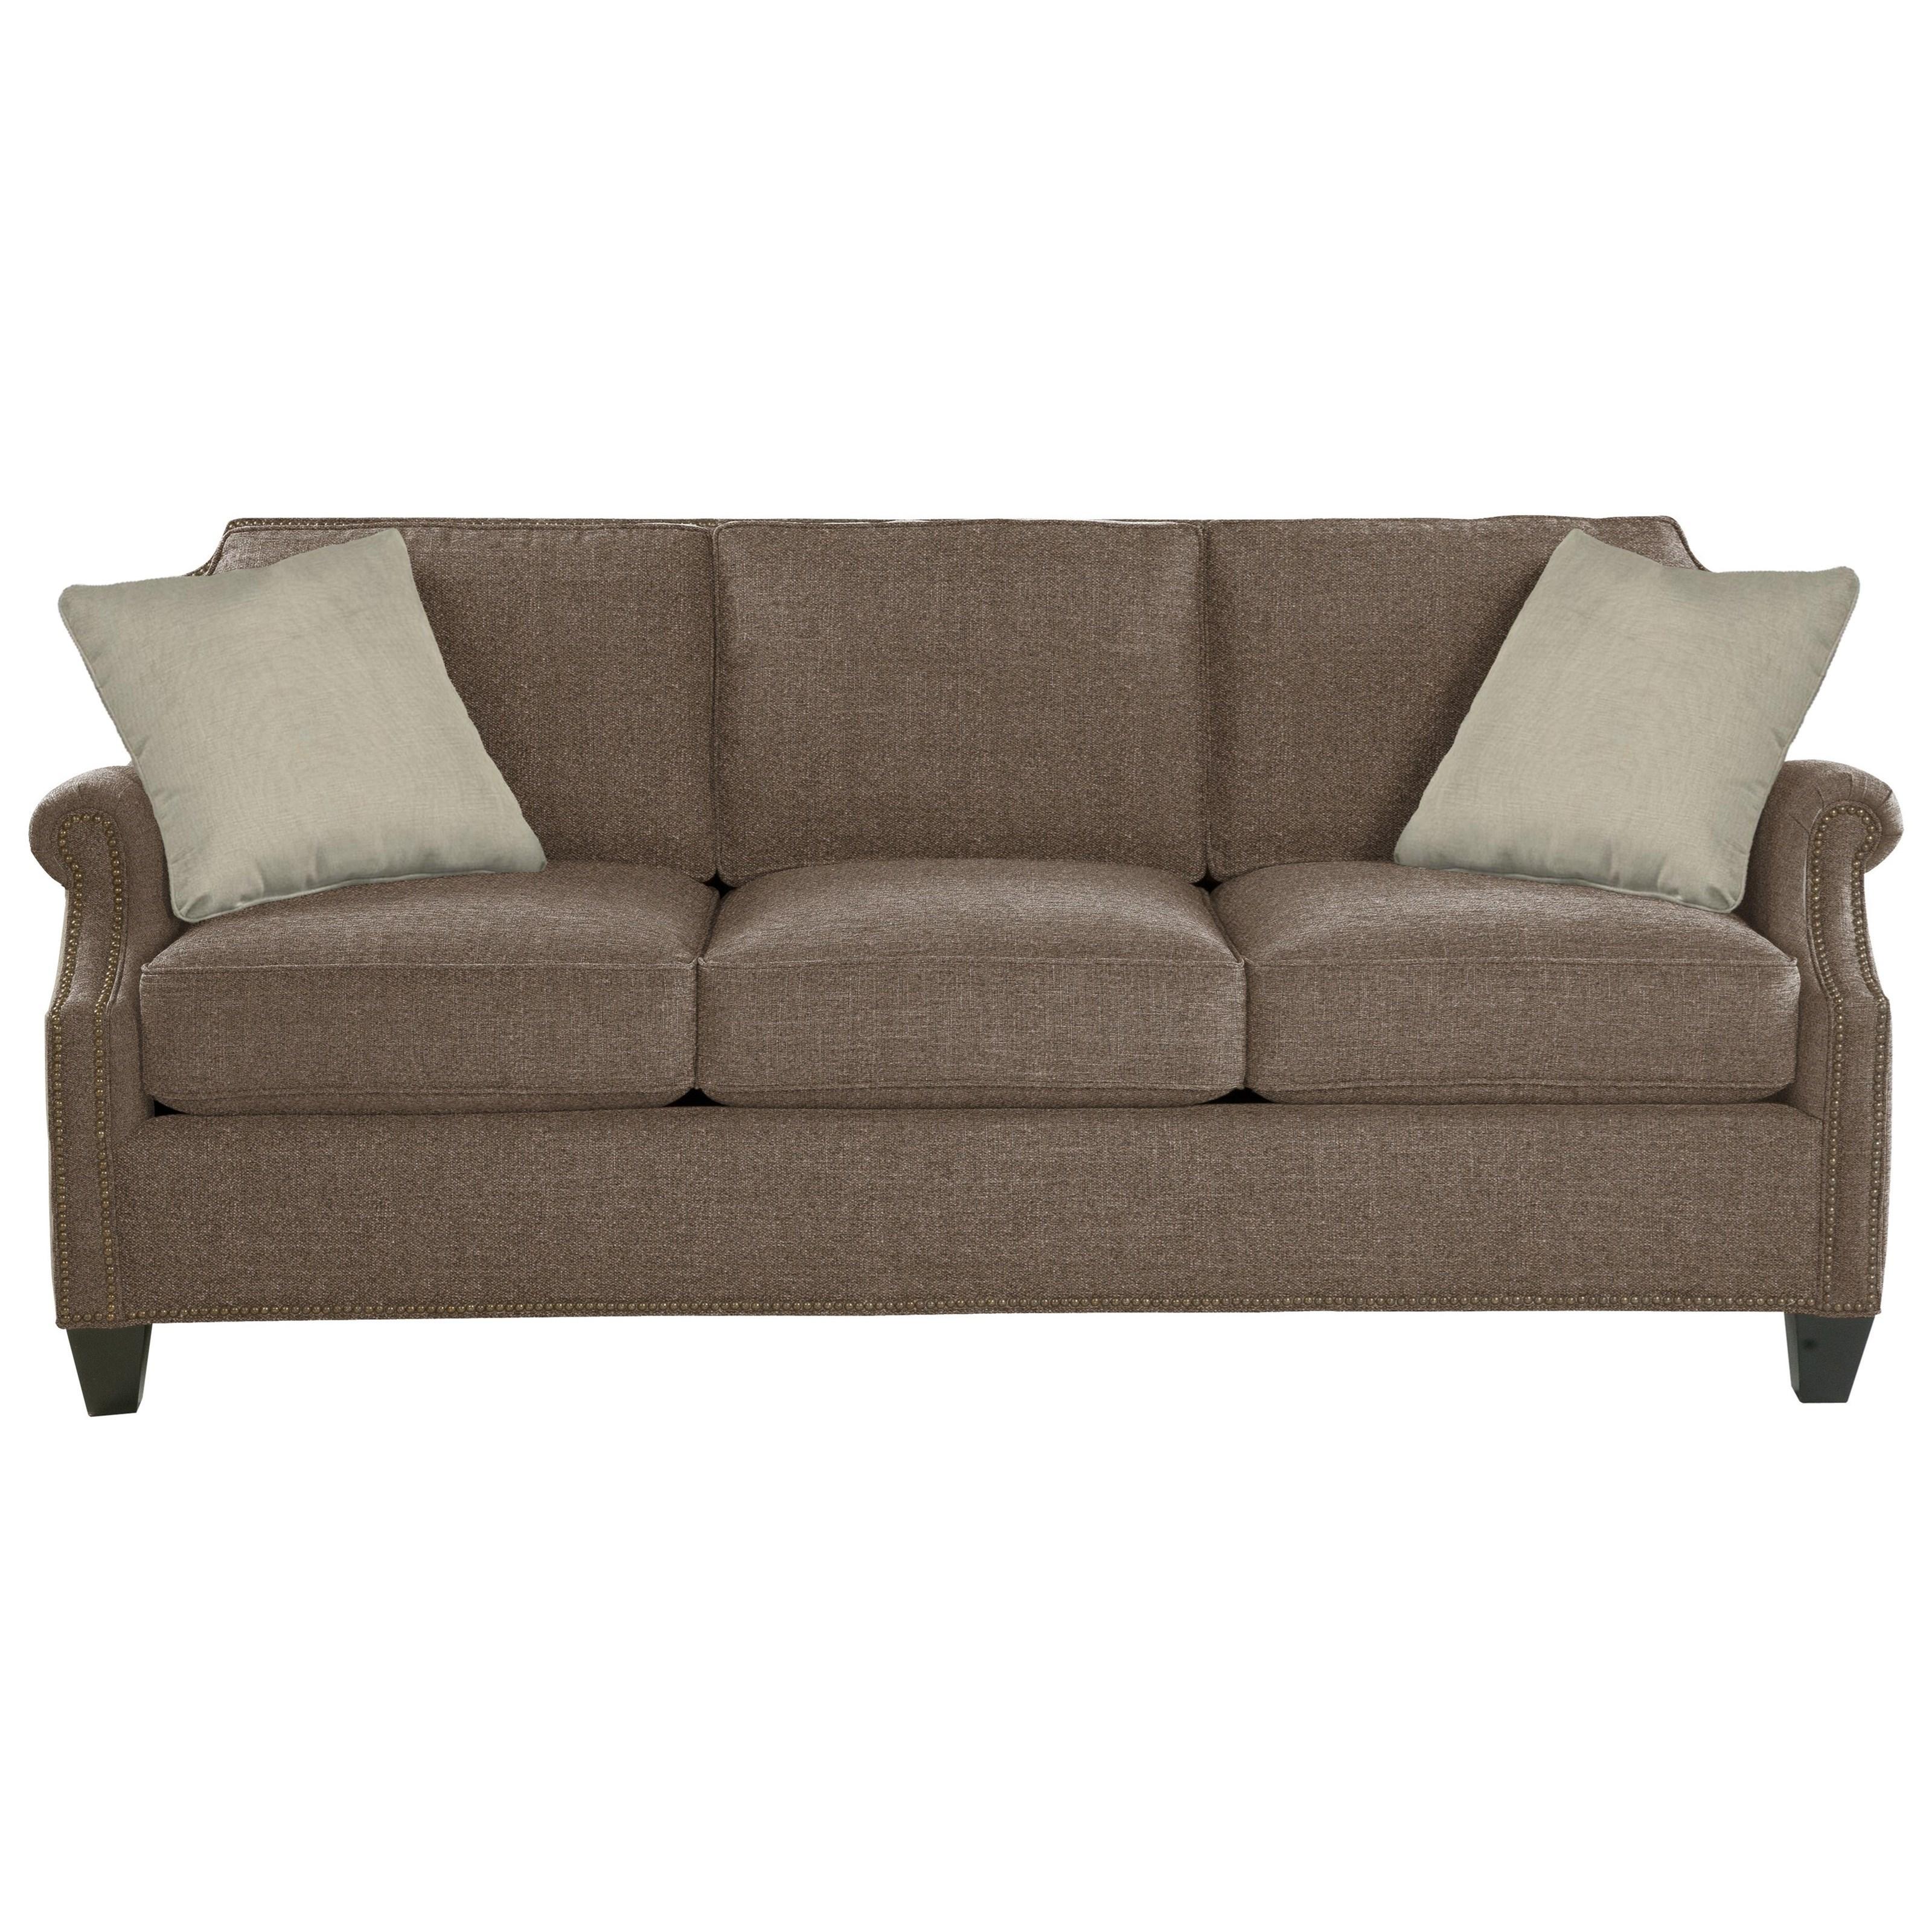 9383 Sofa by Craftmaster at Baer's Furniture